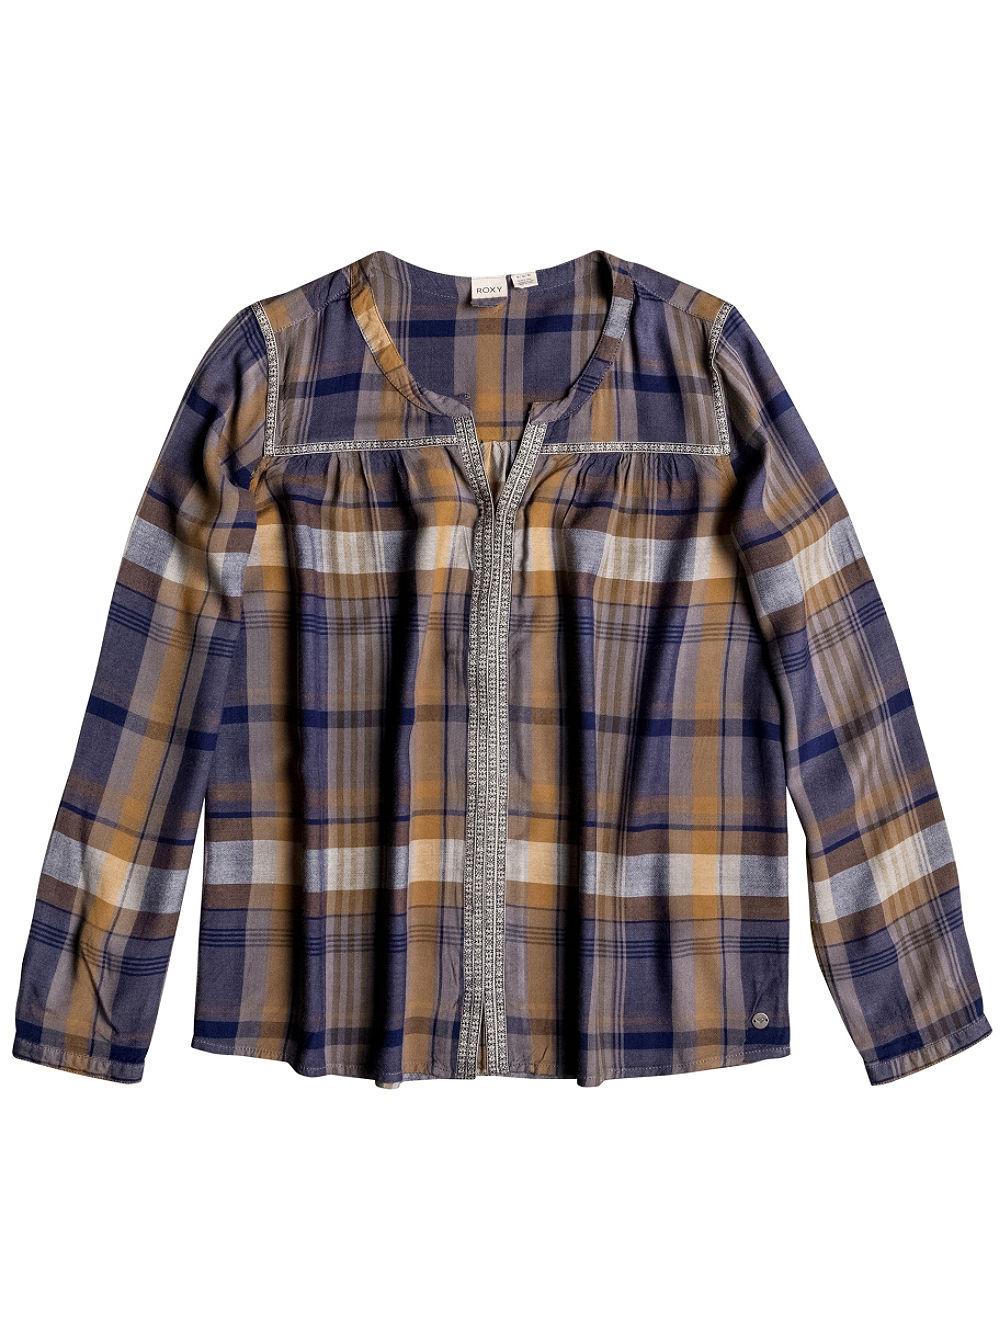 roxy-keep-on-shirt-ls